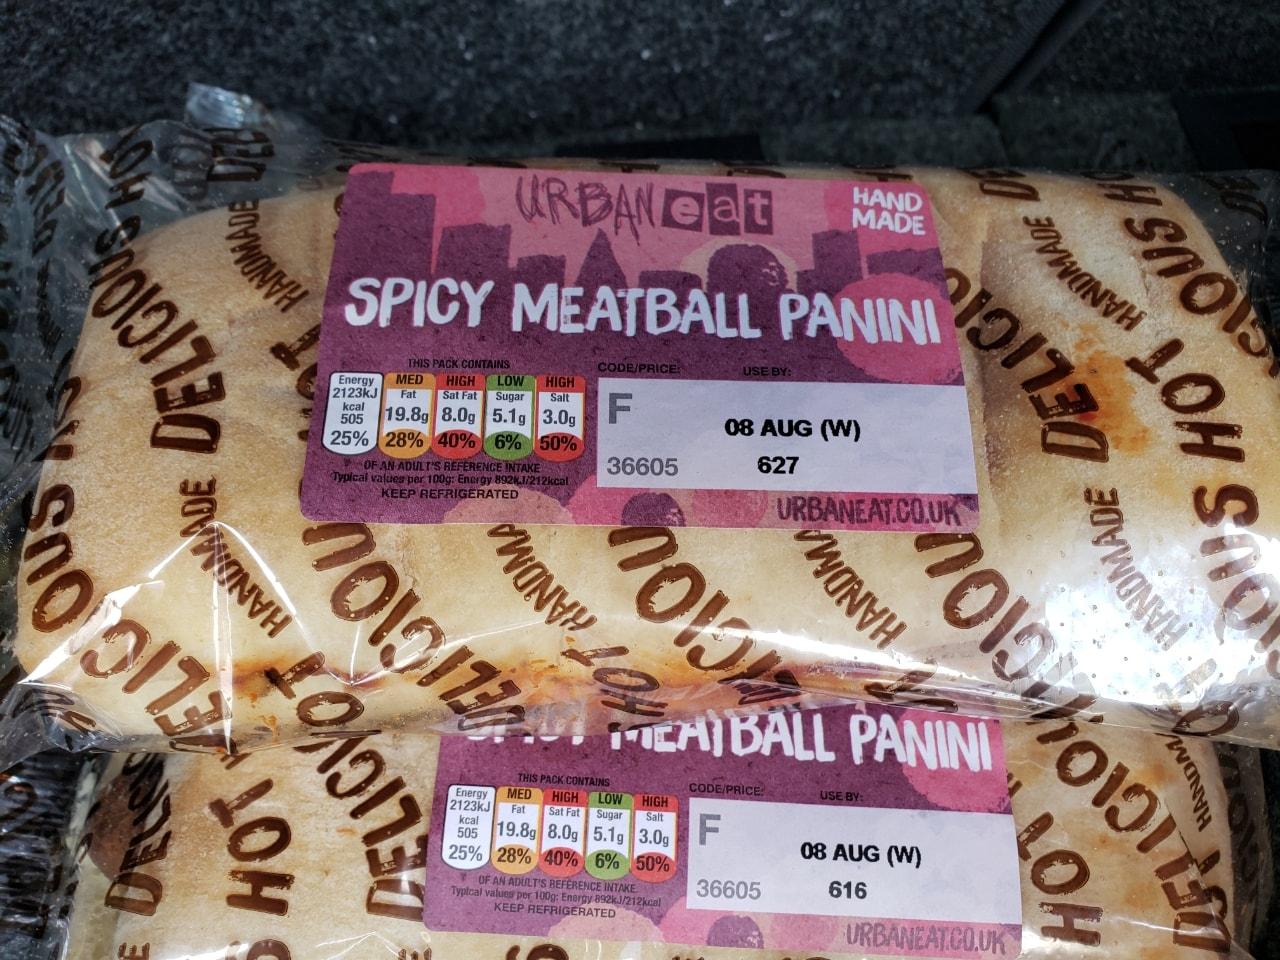 Spicy meatball panini